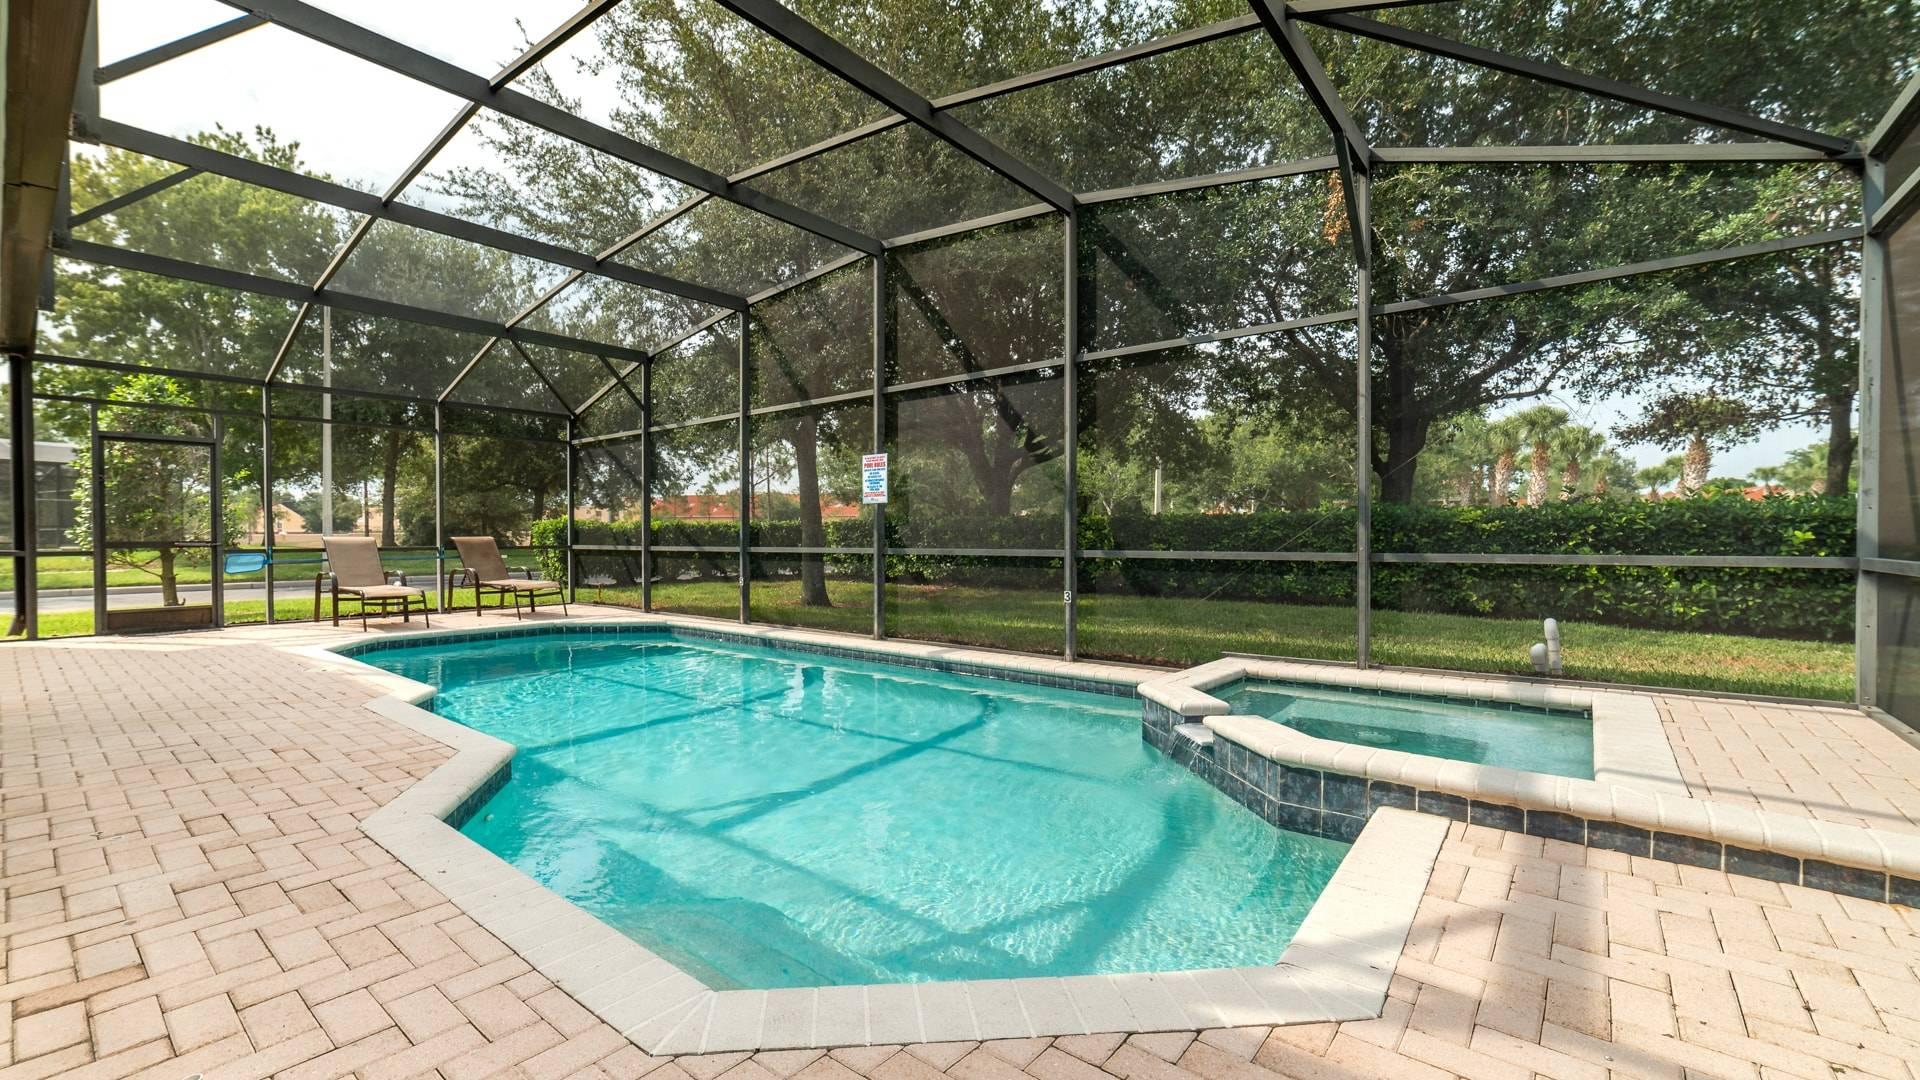 Pool & Spa & Patio